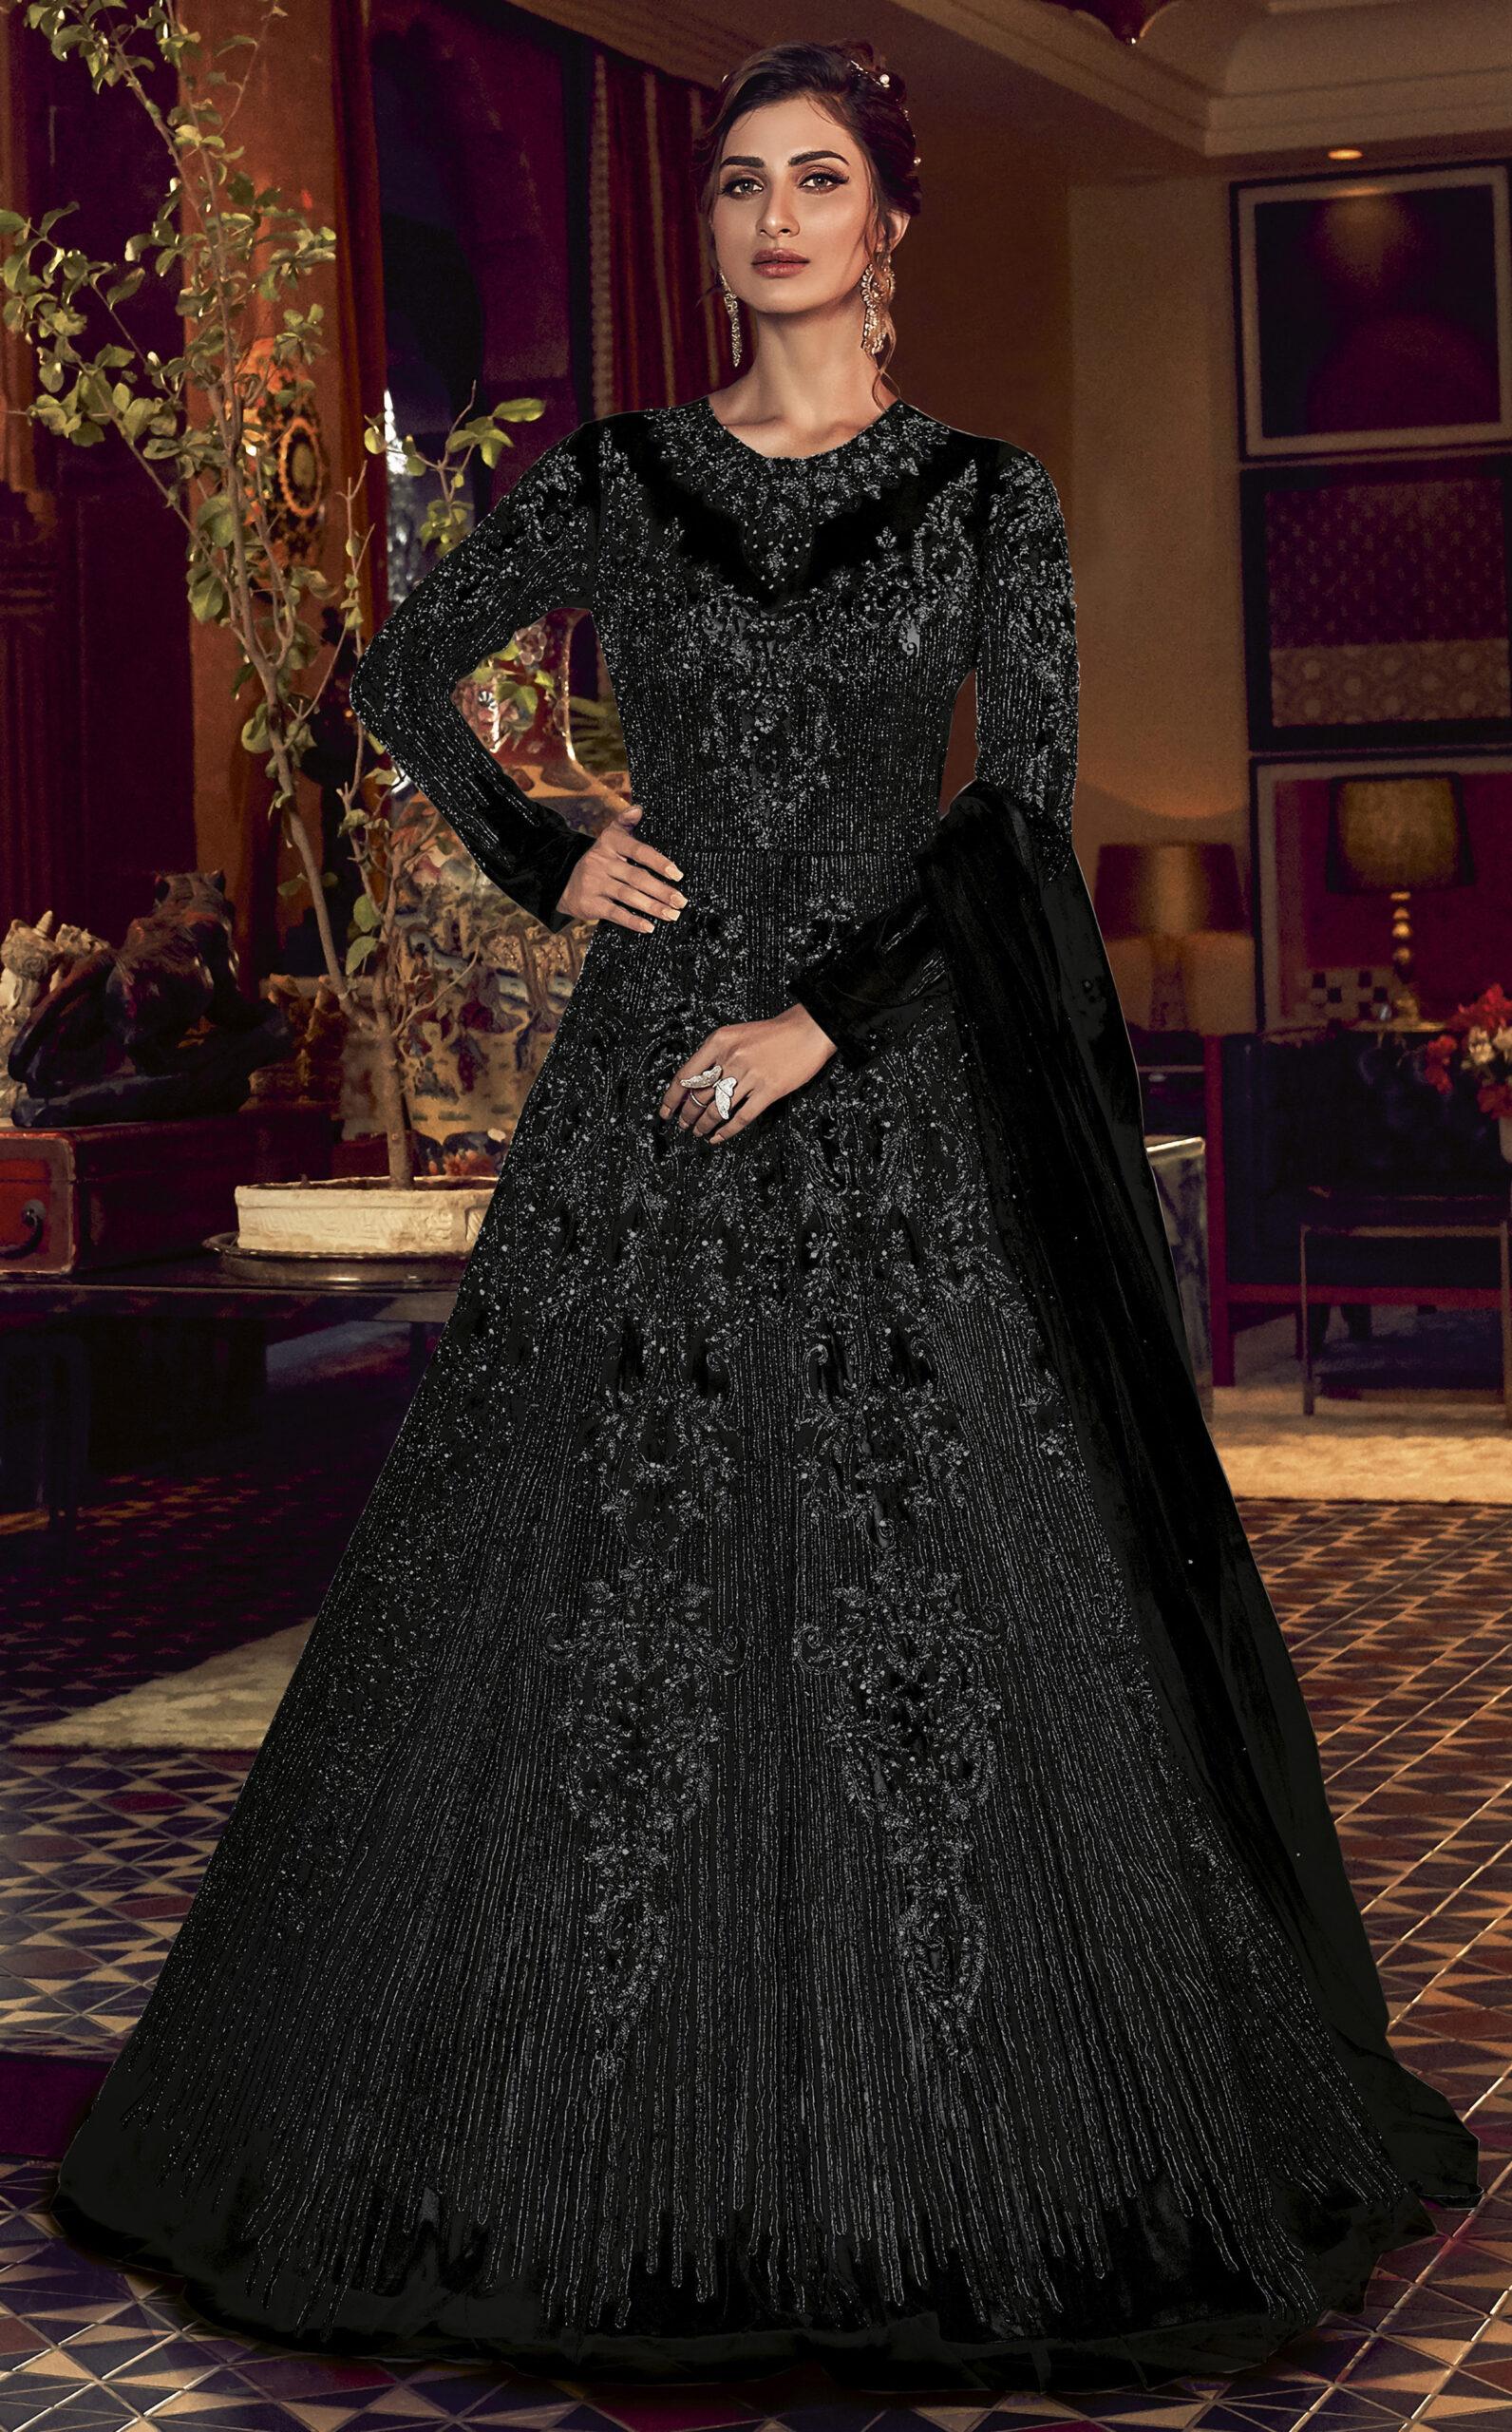 Heavy Net Designer Black Dress For A Party